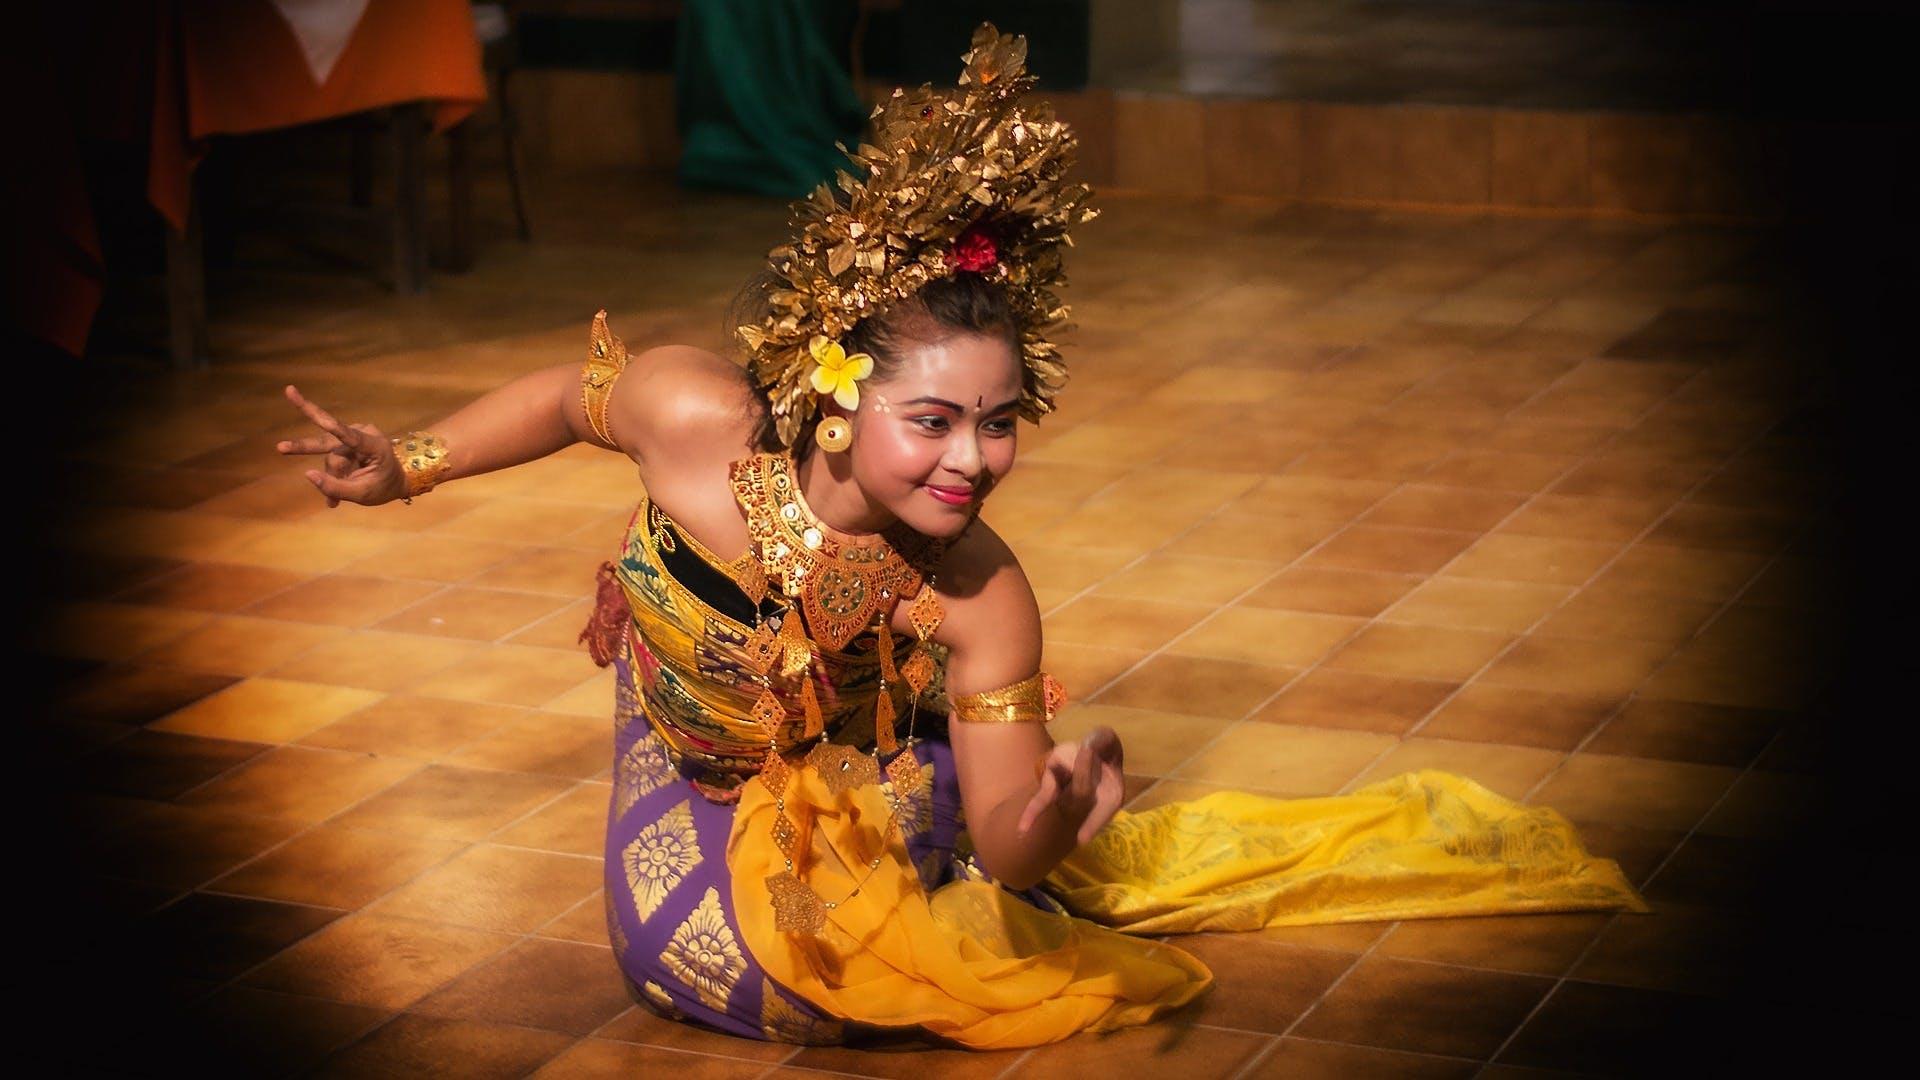 Free stock photo of holiday, travel, dance, bali